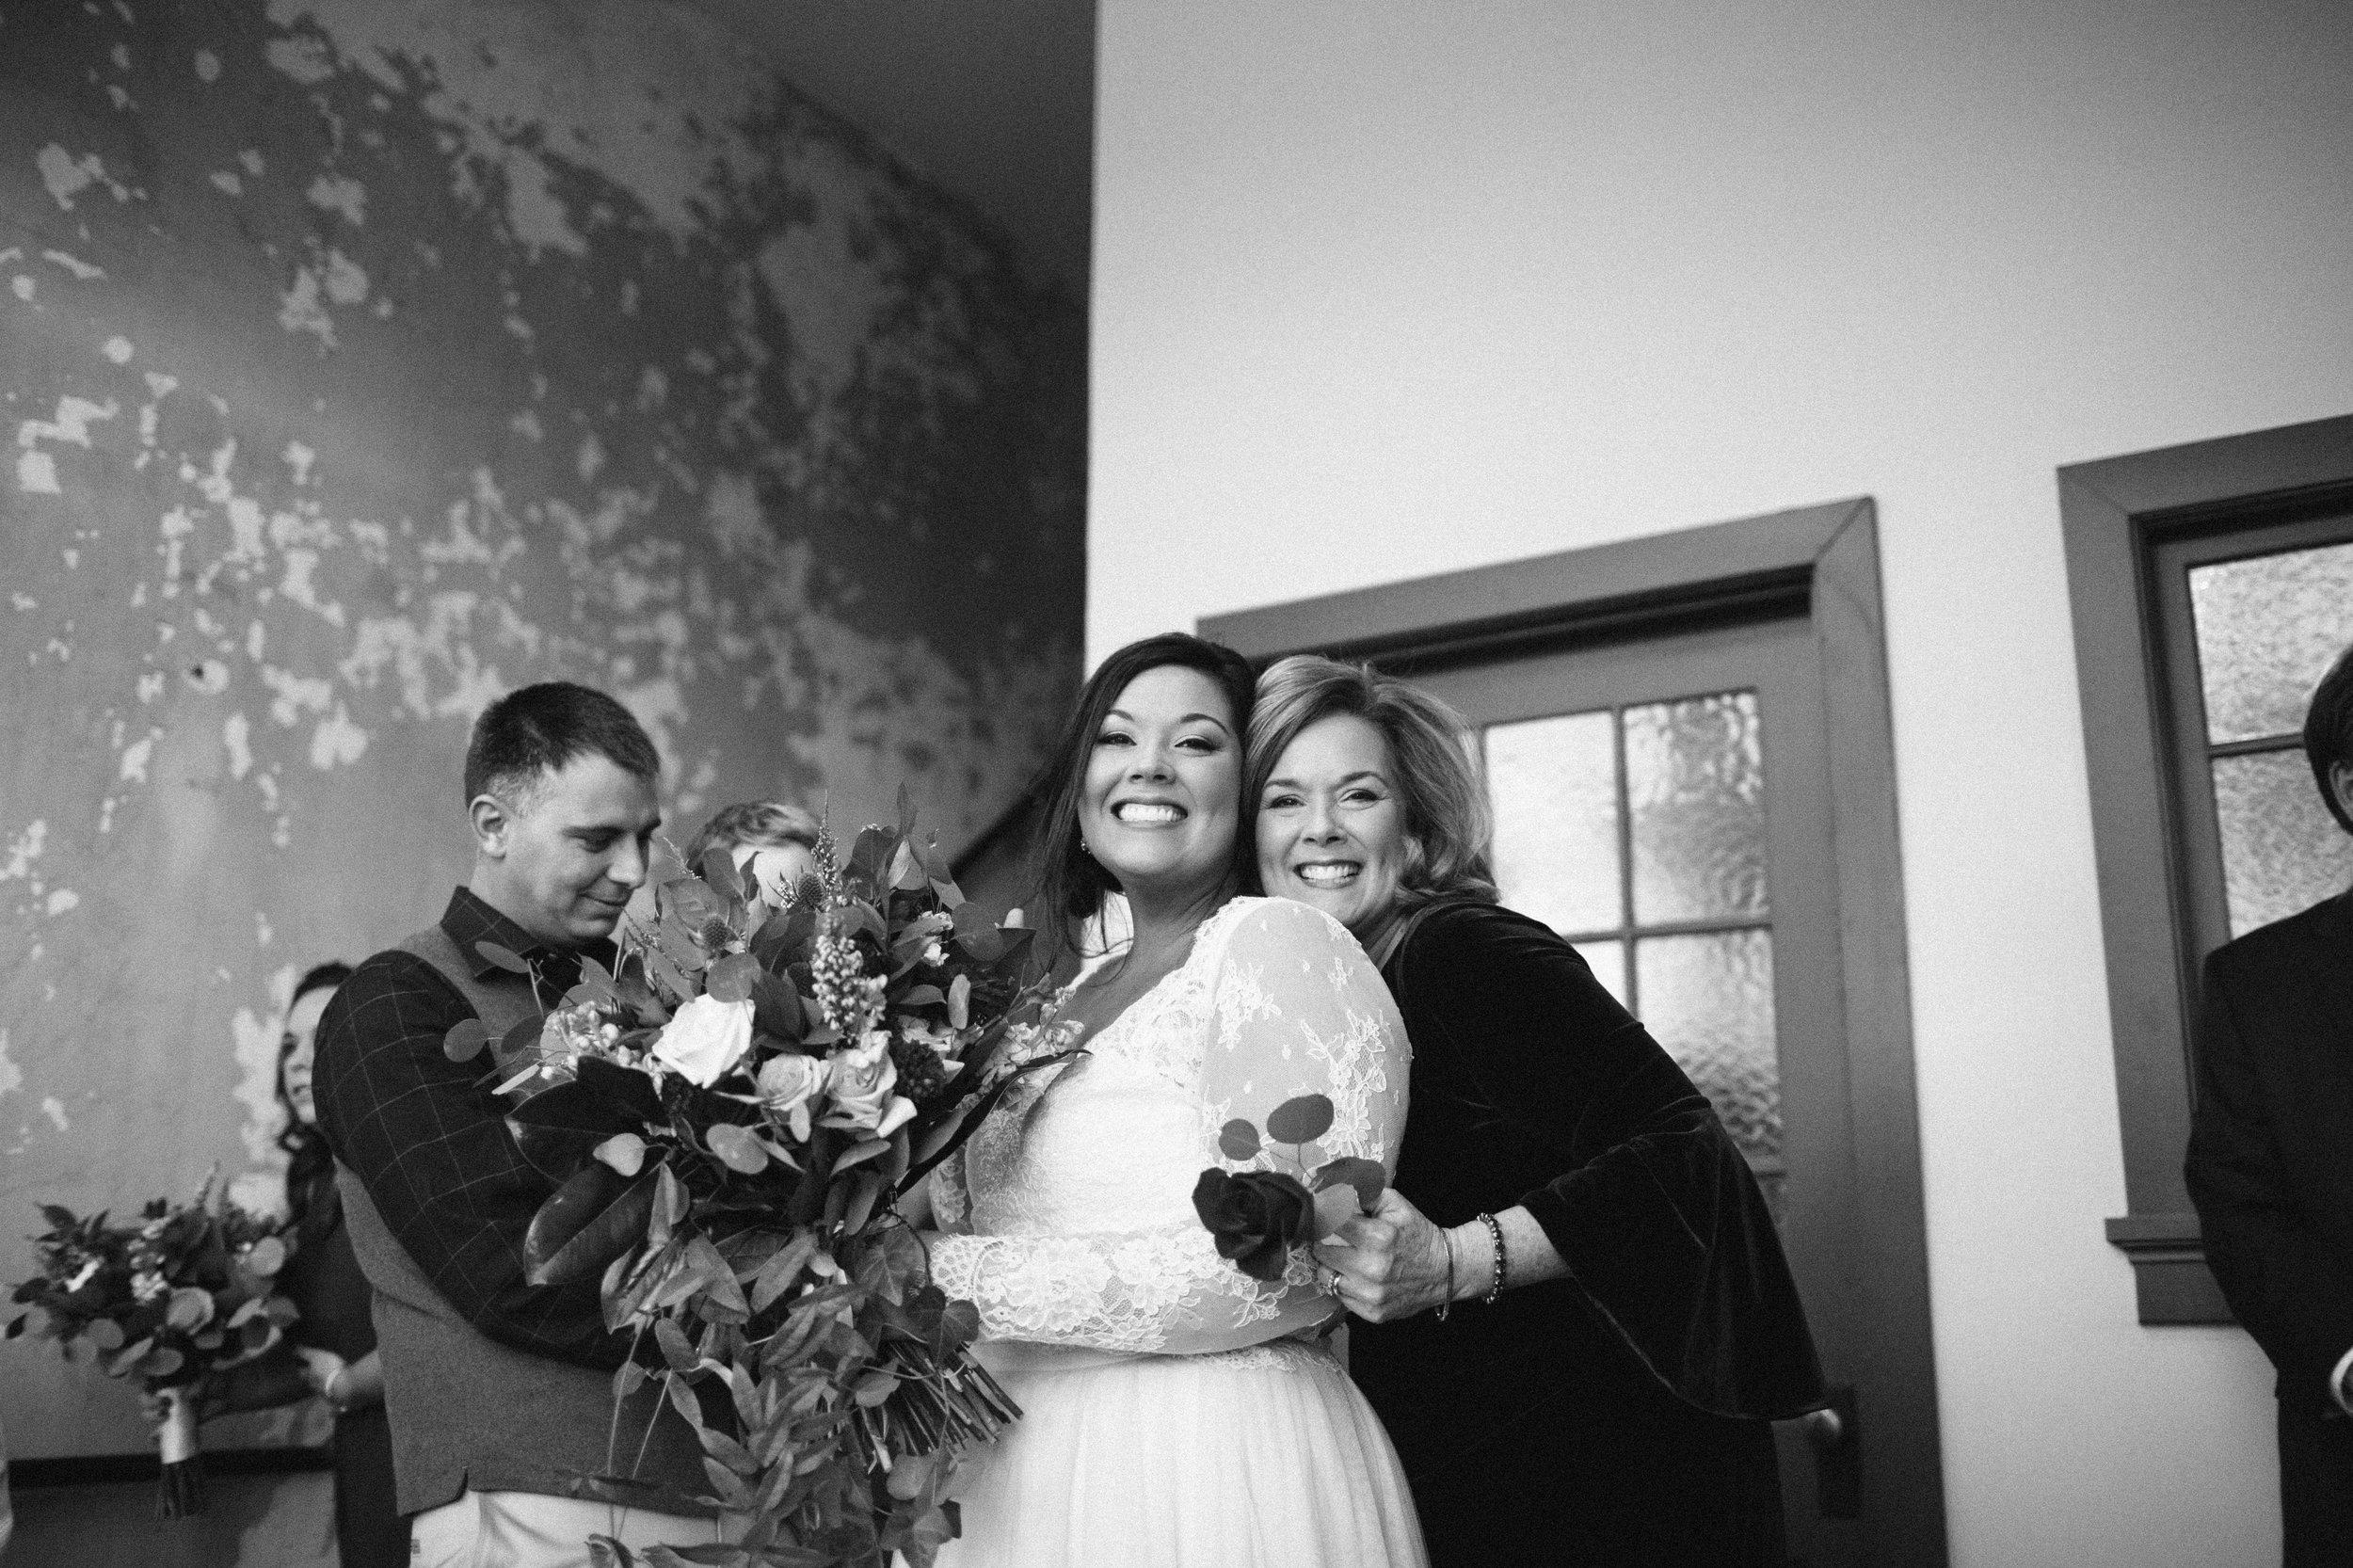 Lauren_Jeremy_Standard_Wedding_Knoxville_Abigail_Malone_Photography_FIlm-504.jpg